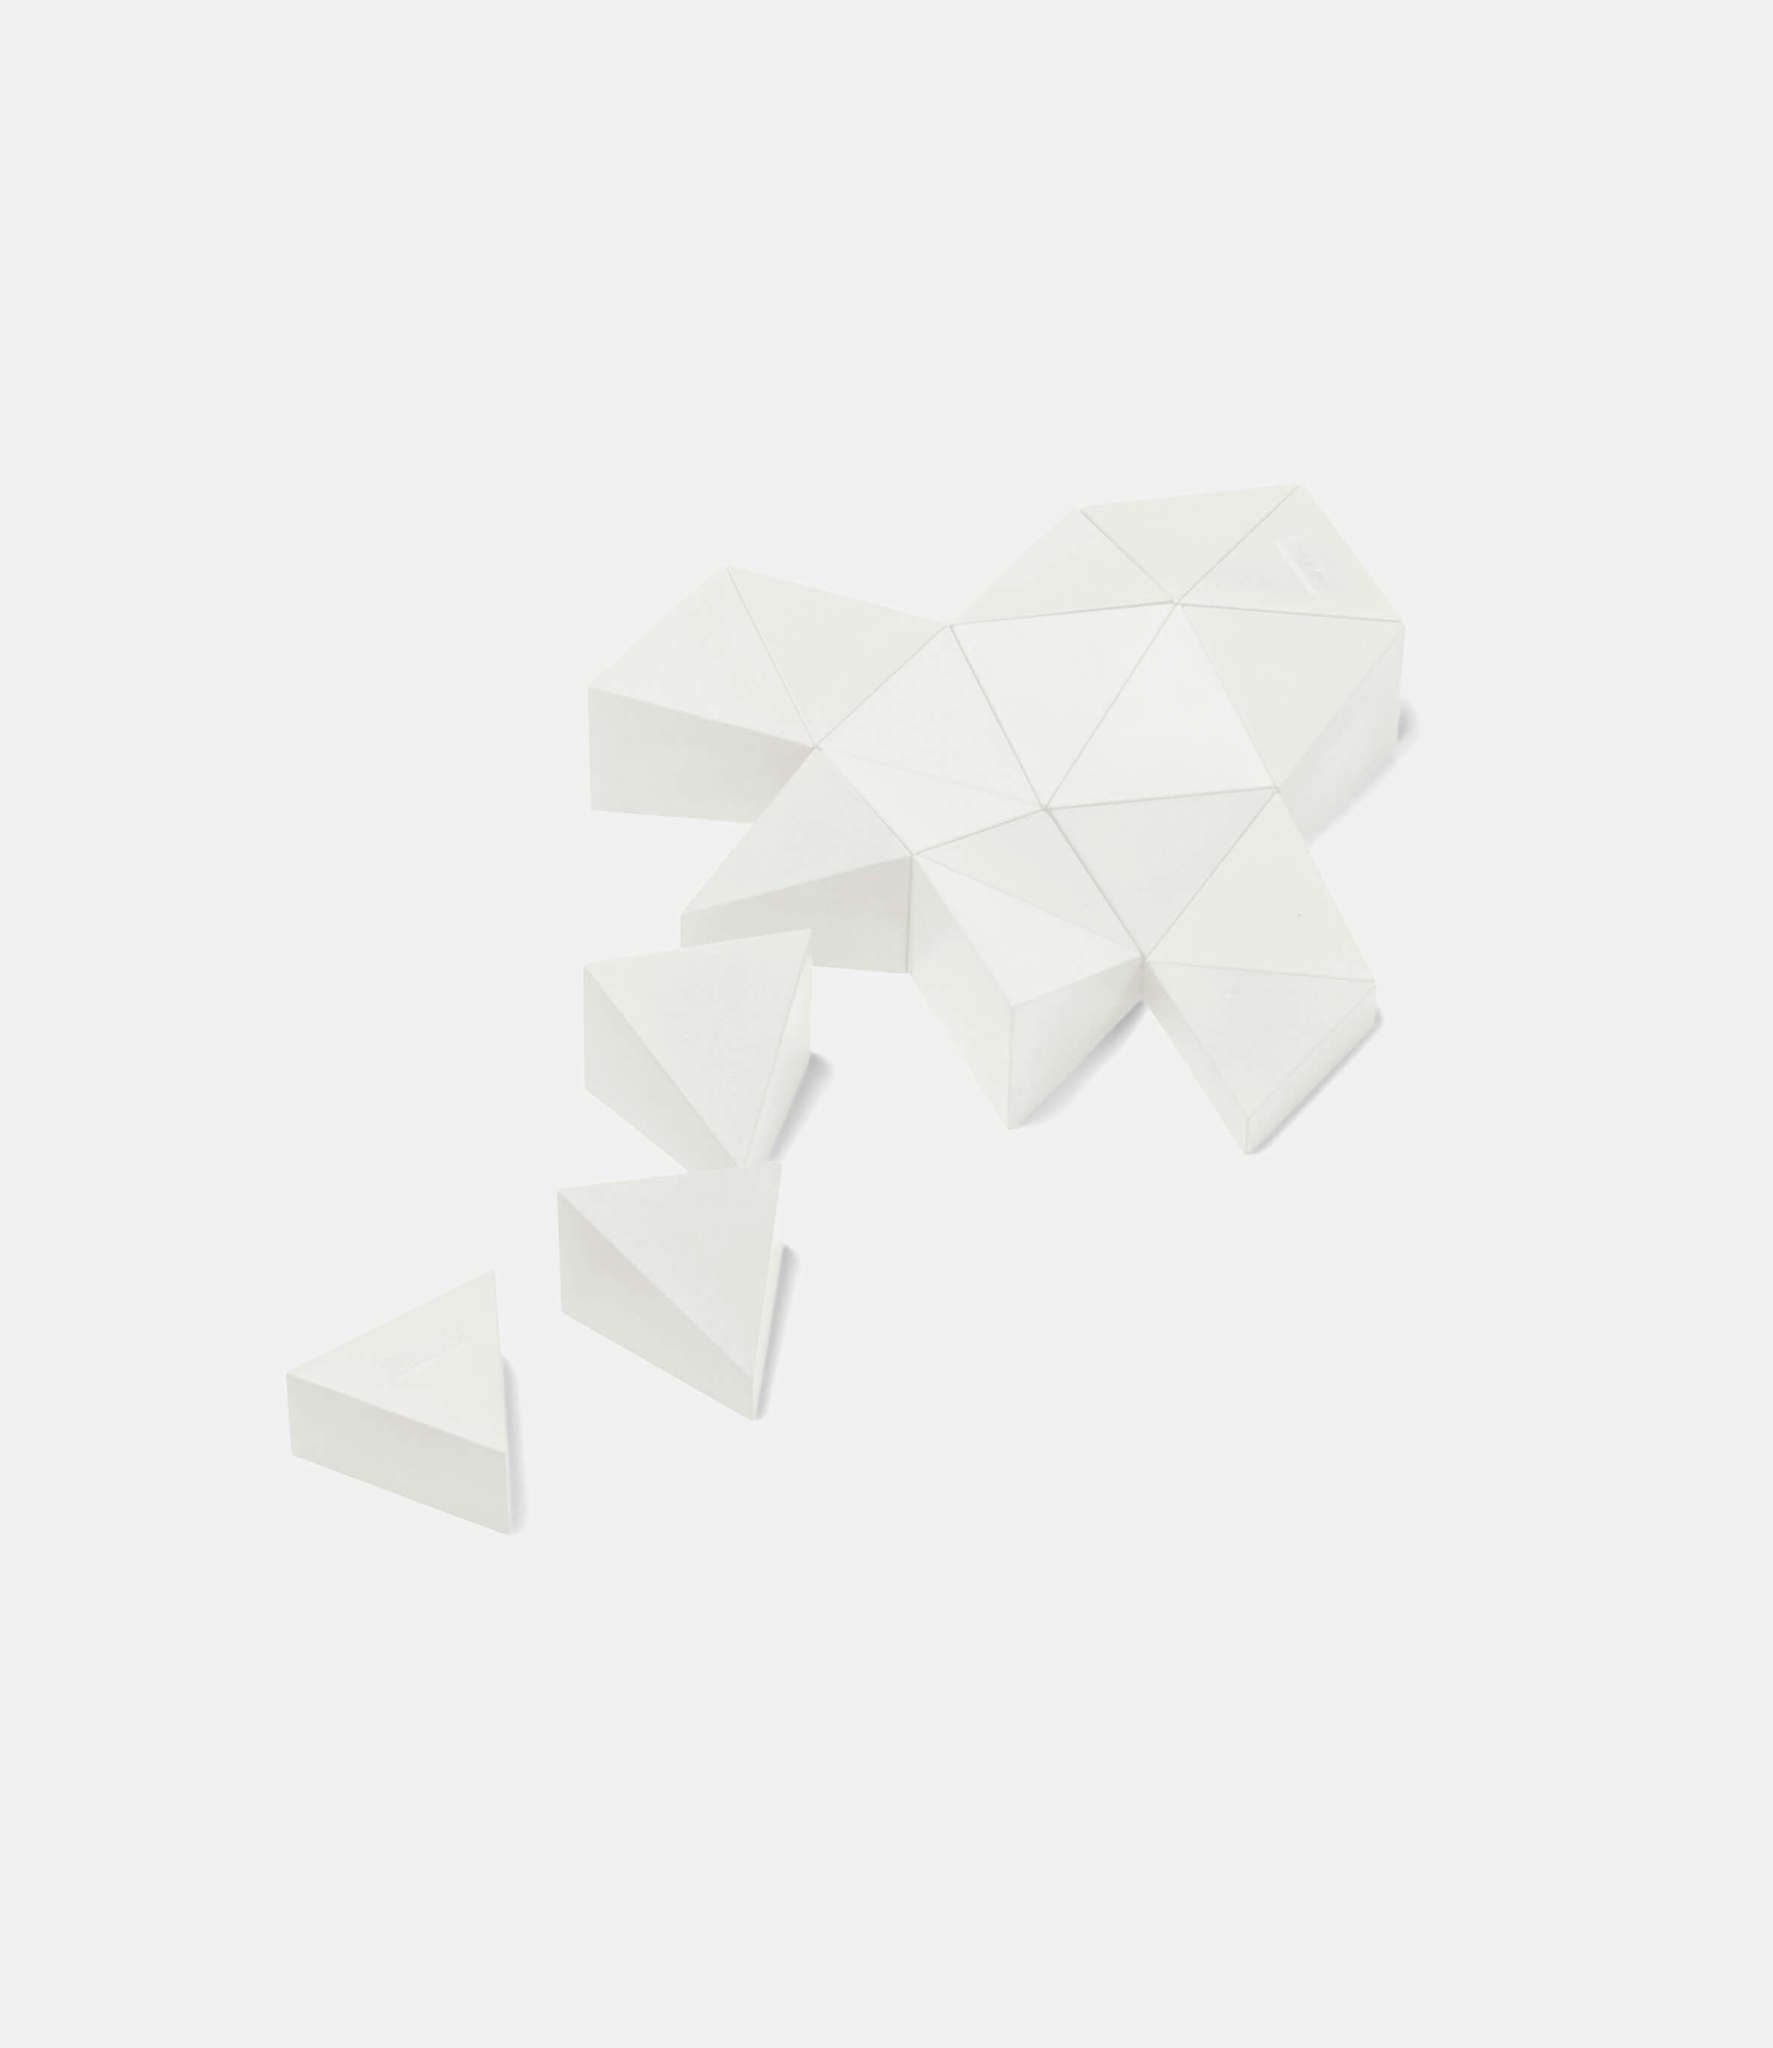 Logideez Logifaces Original Set Marble— пазл из бетона: белый мрамор